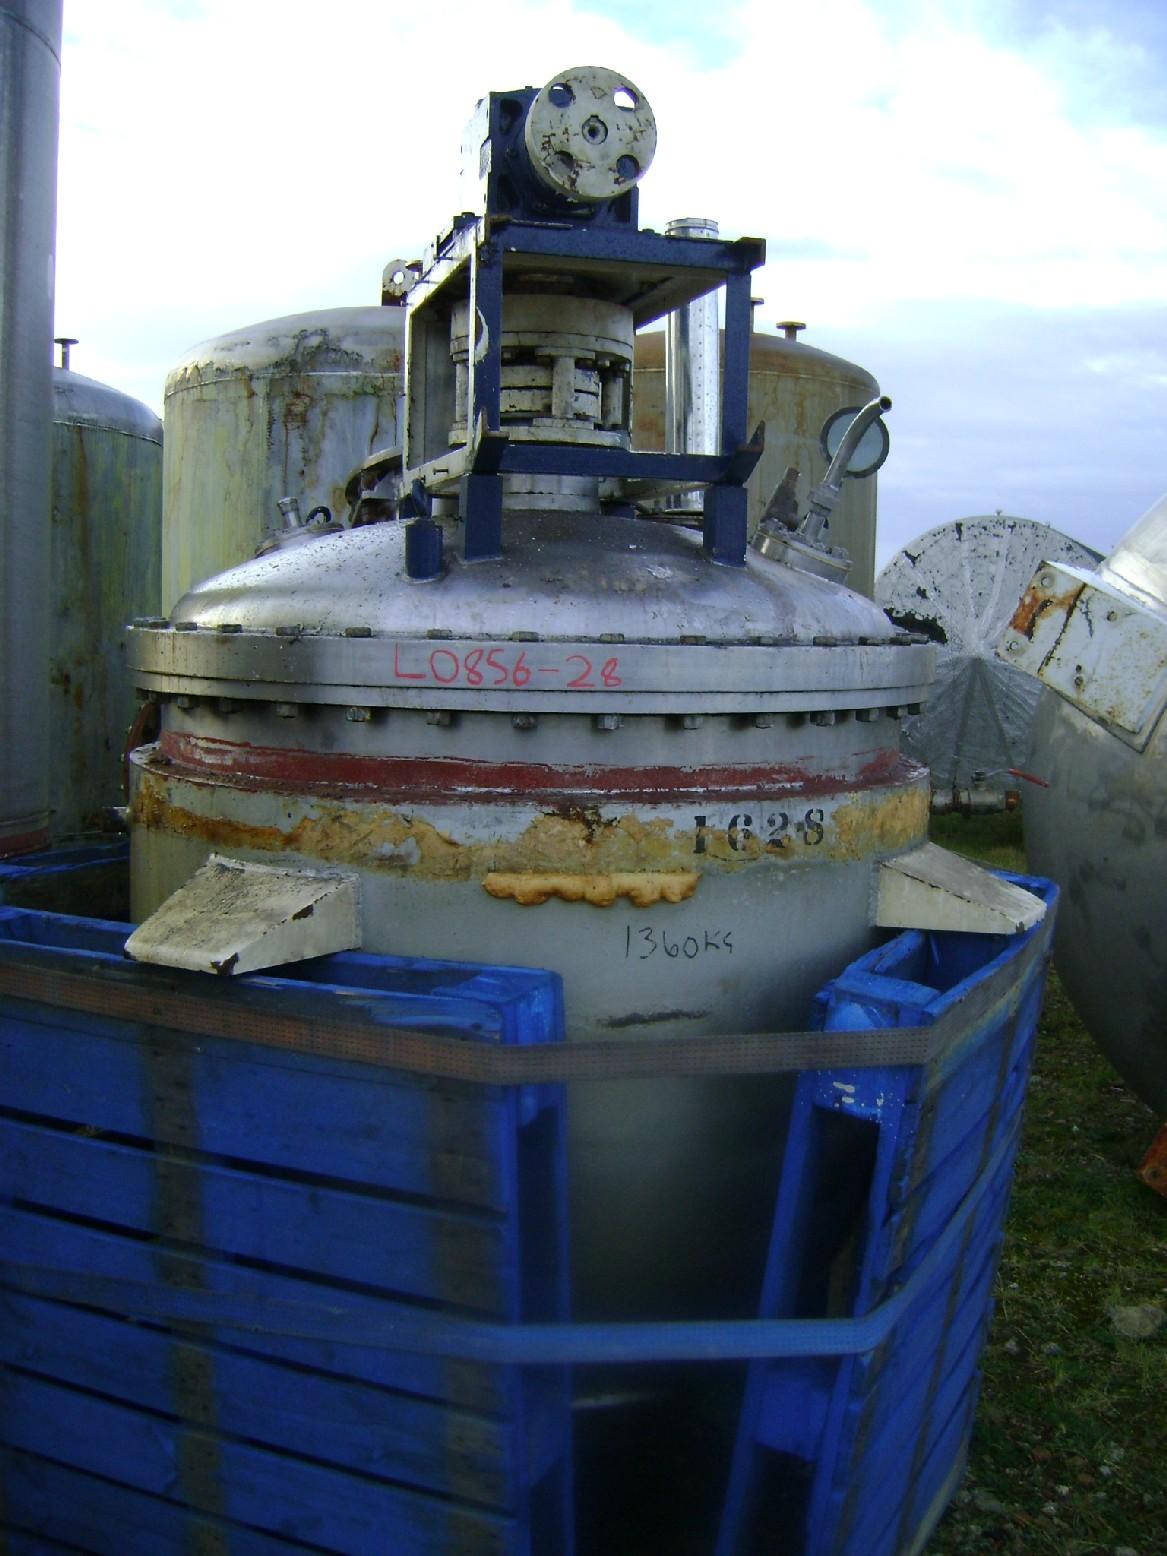 1,000 Litre, 2.07 Bar Jacket Stainless Steel Reactor